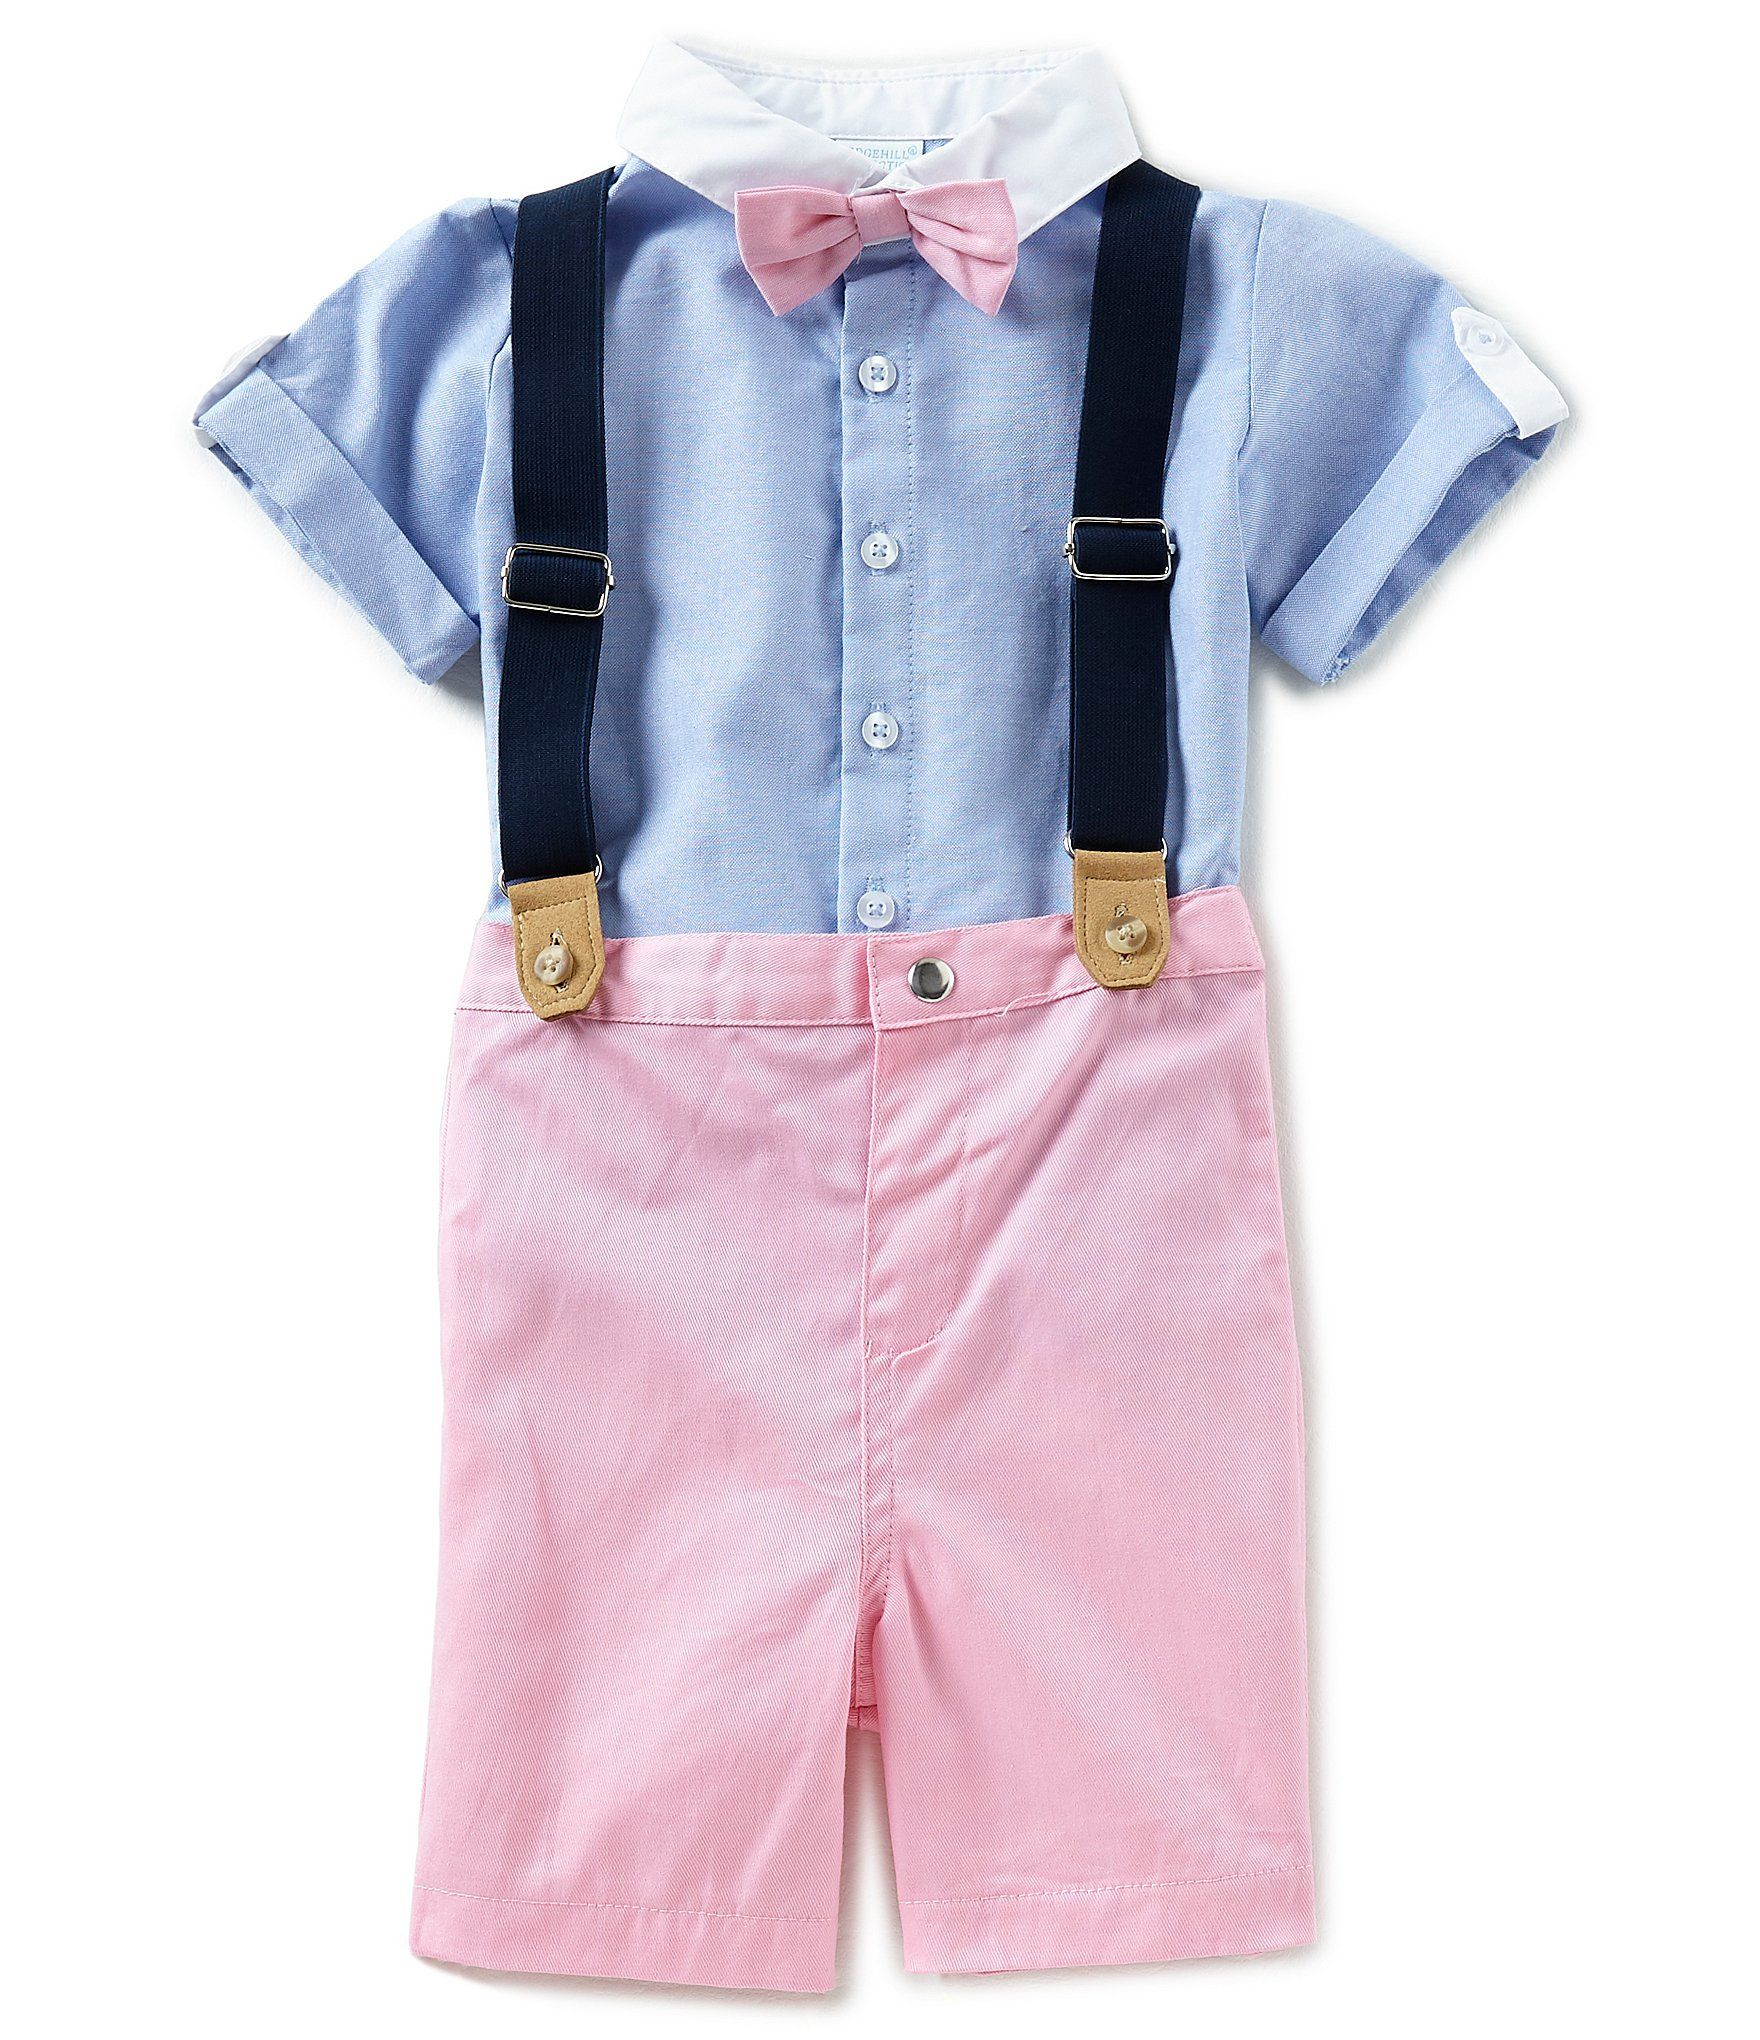 Shop For Edgehill Collection Baby Boys Newborn 24 Months